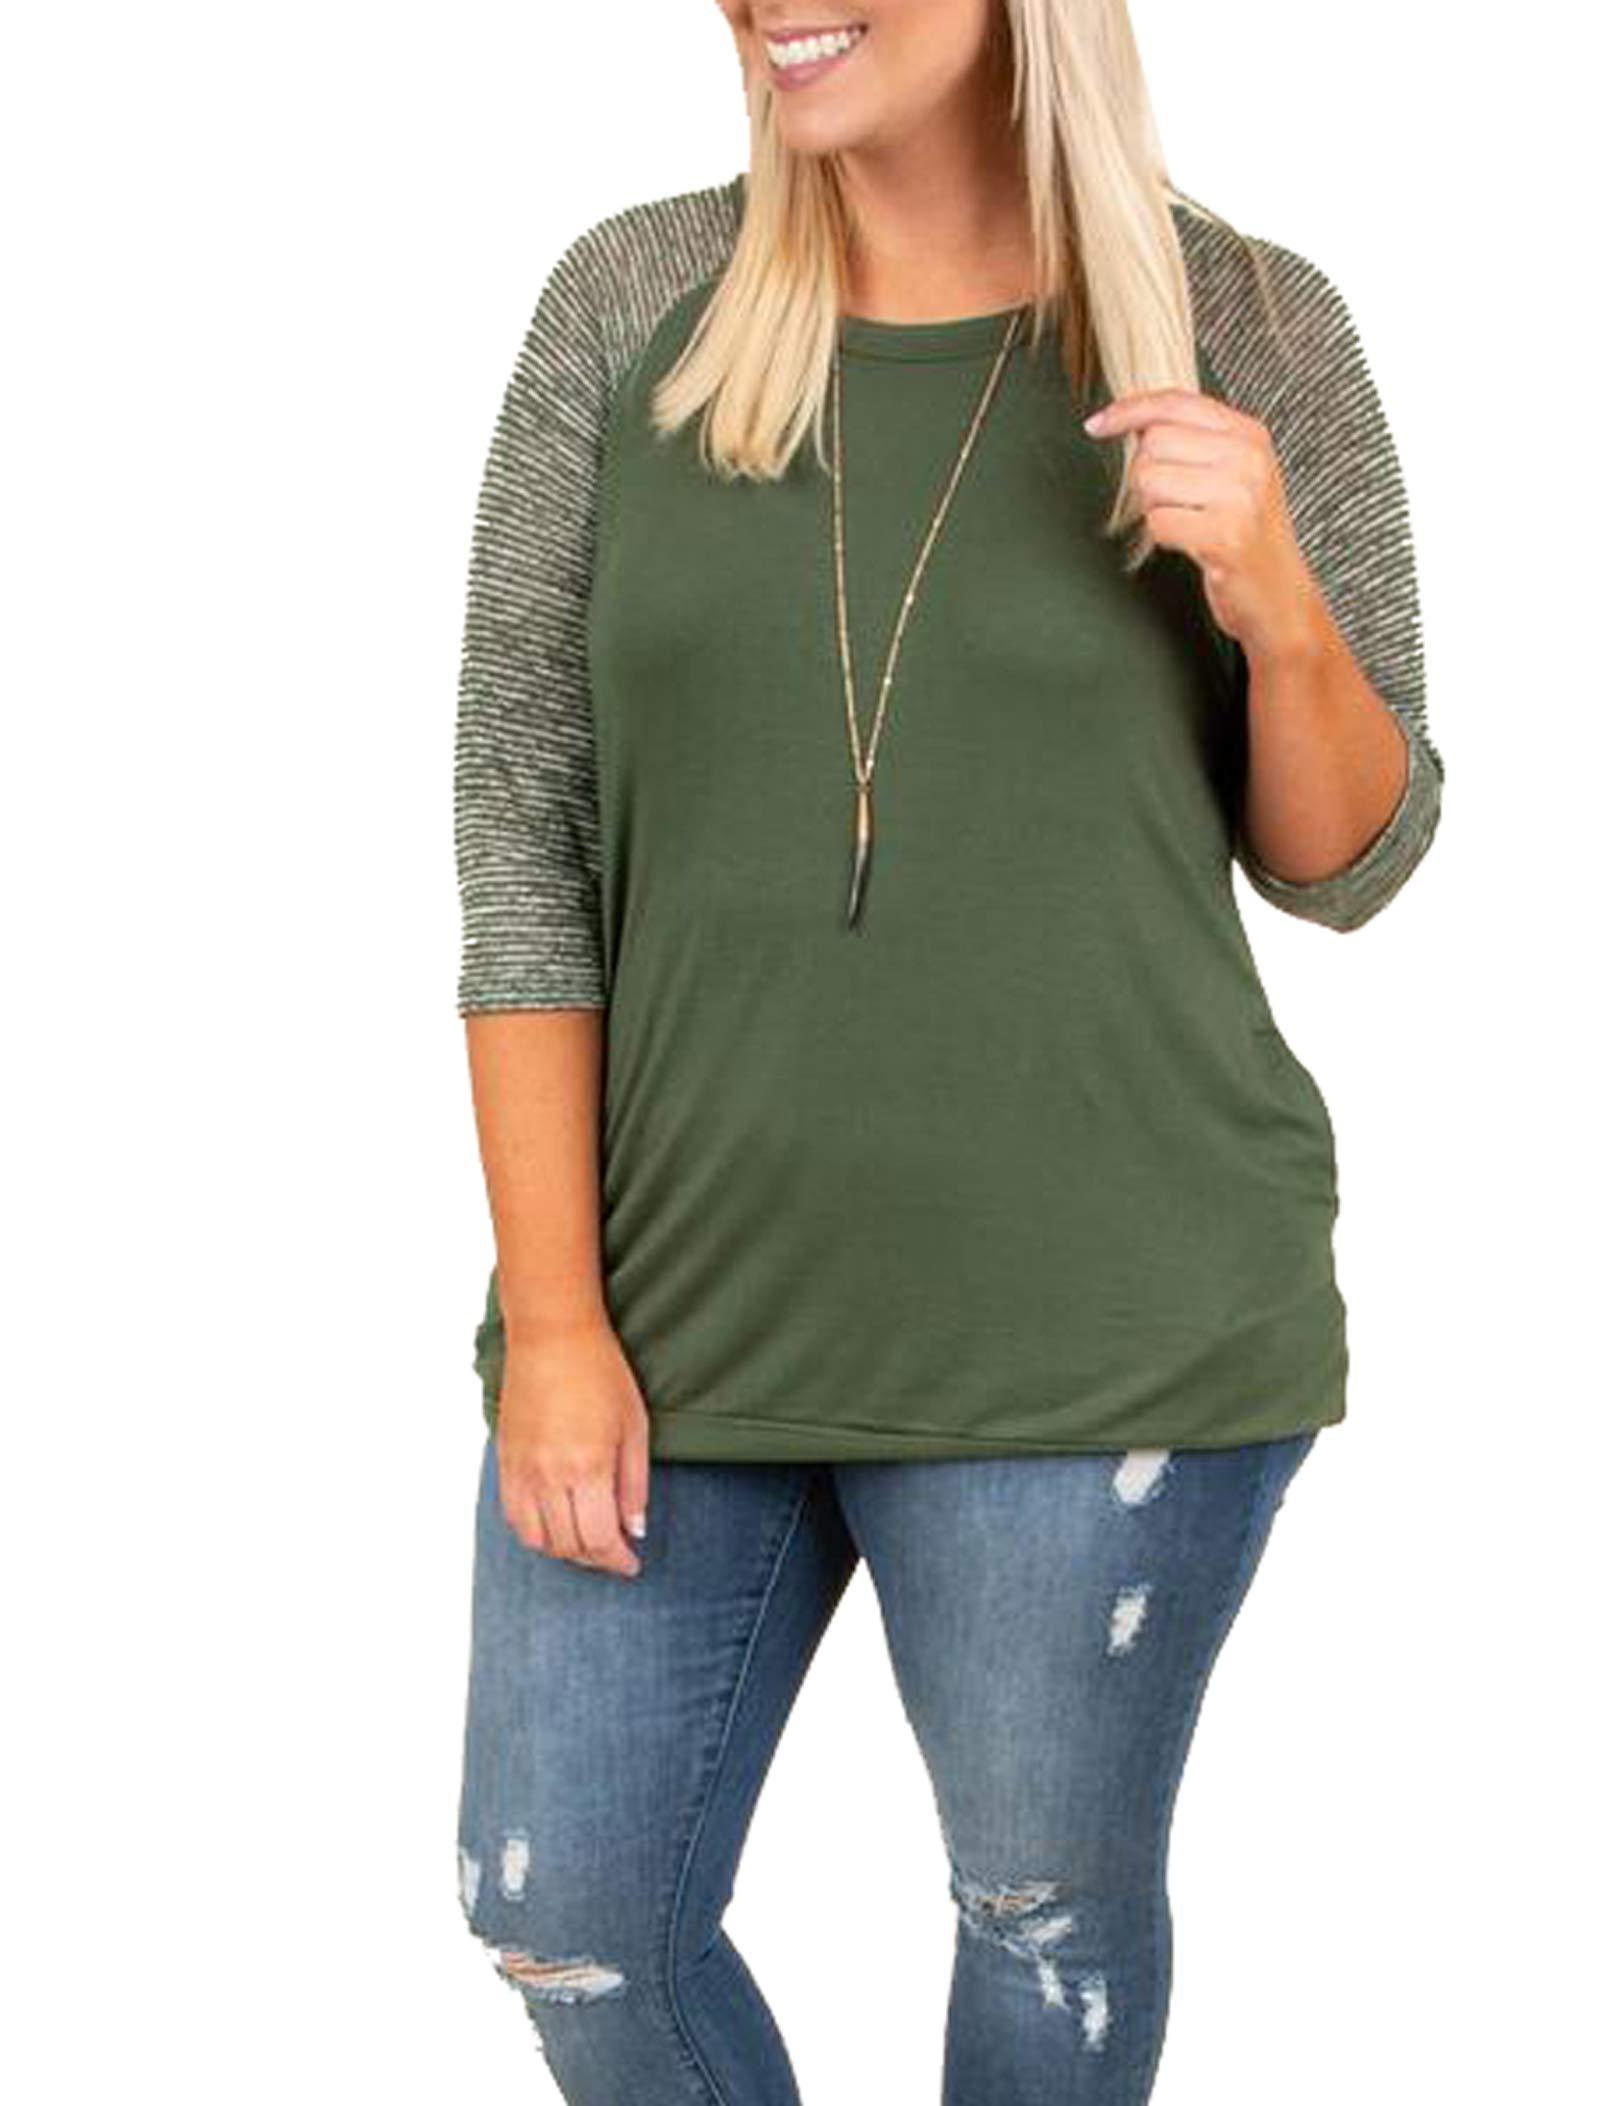 Rotita Women Raglan Sweatshirt Plus Size Striped 3/4 Sleeve Lightweight Casual Loose Pullover by Rotita (Image #1)